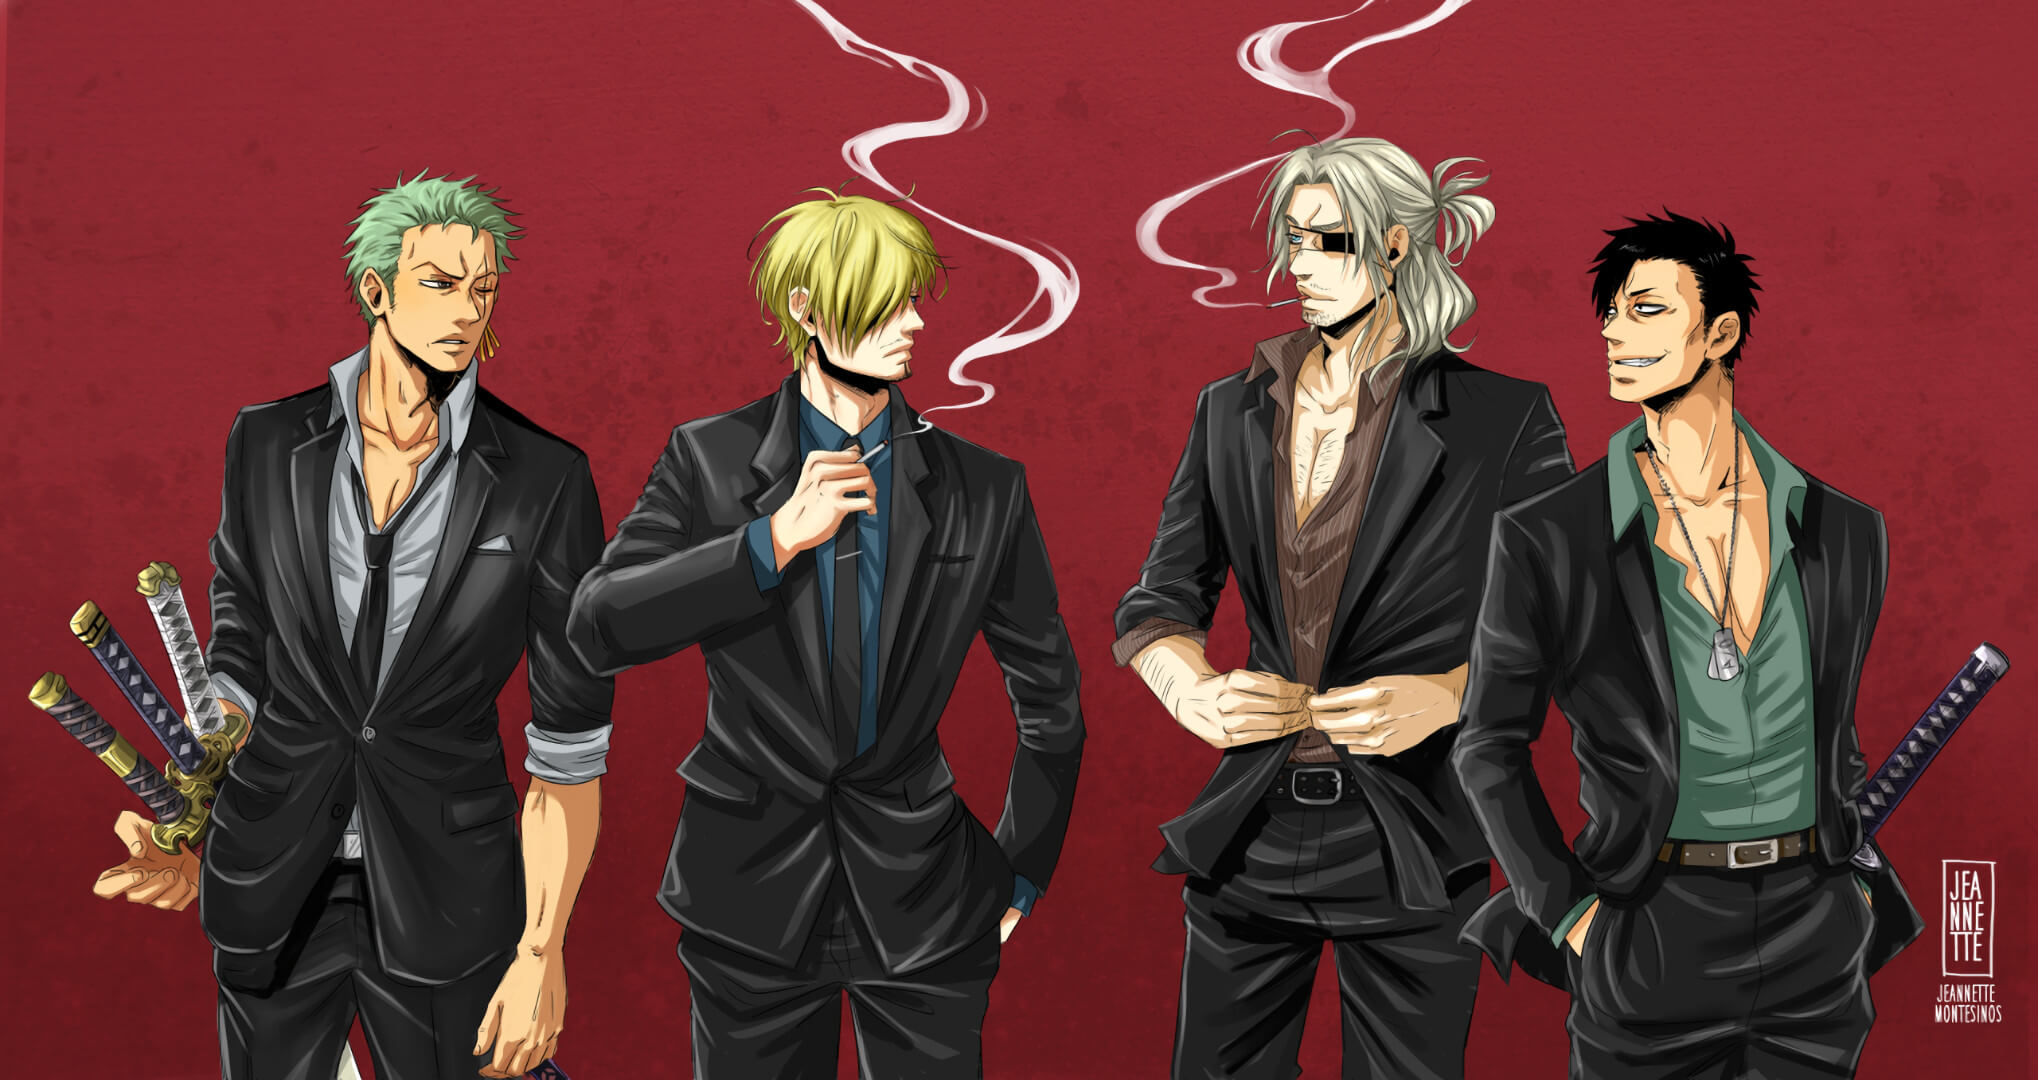 10 Mafia Anime Series if You Like Gangsters - My Otaku World